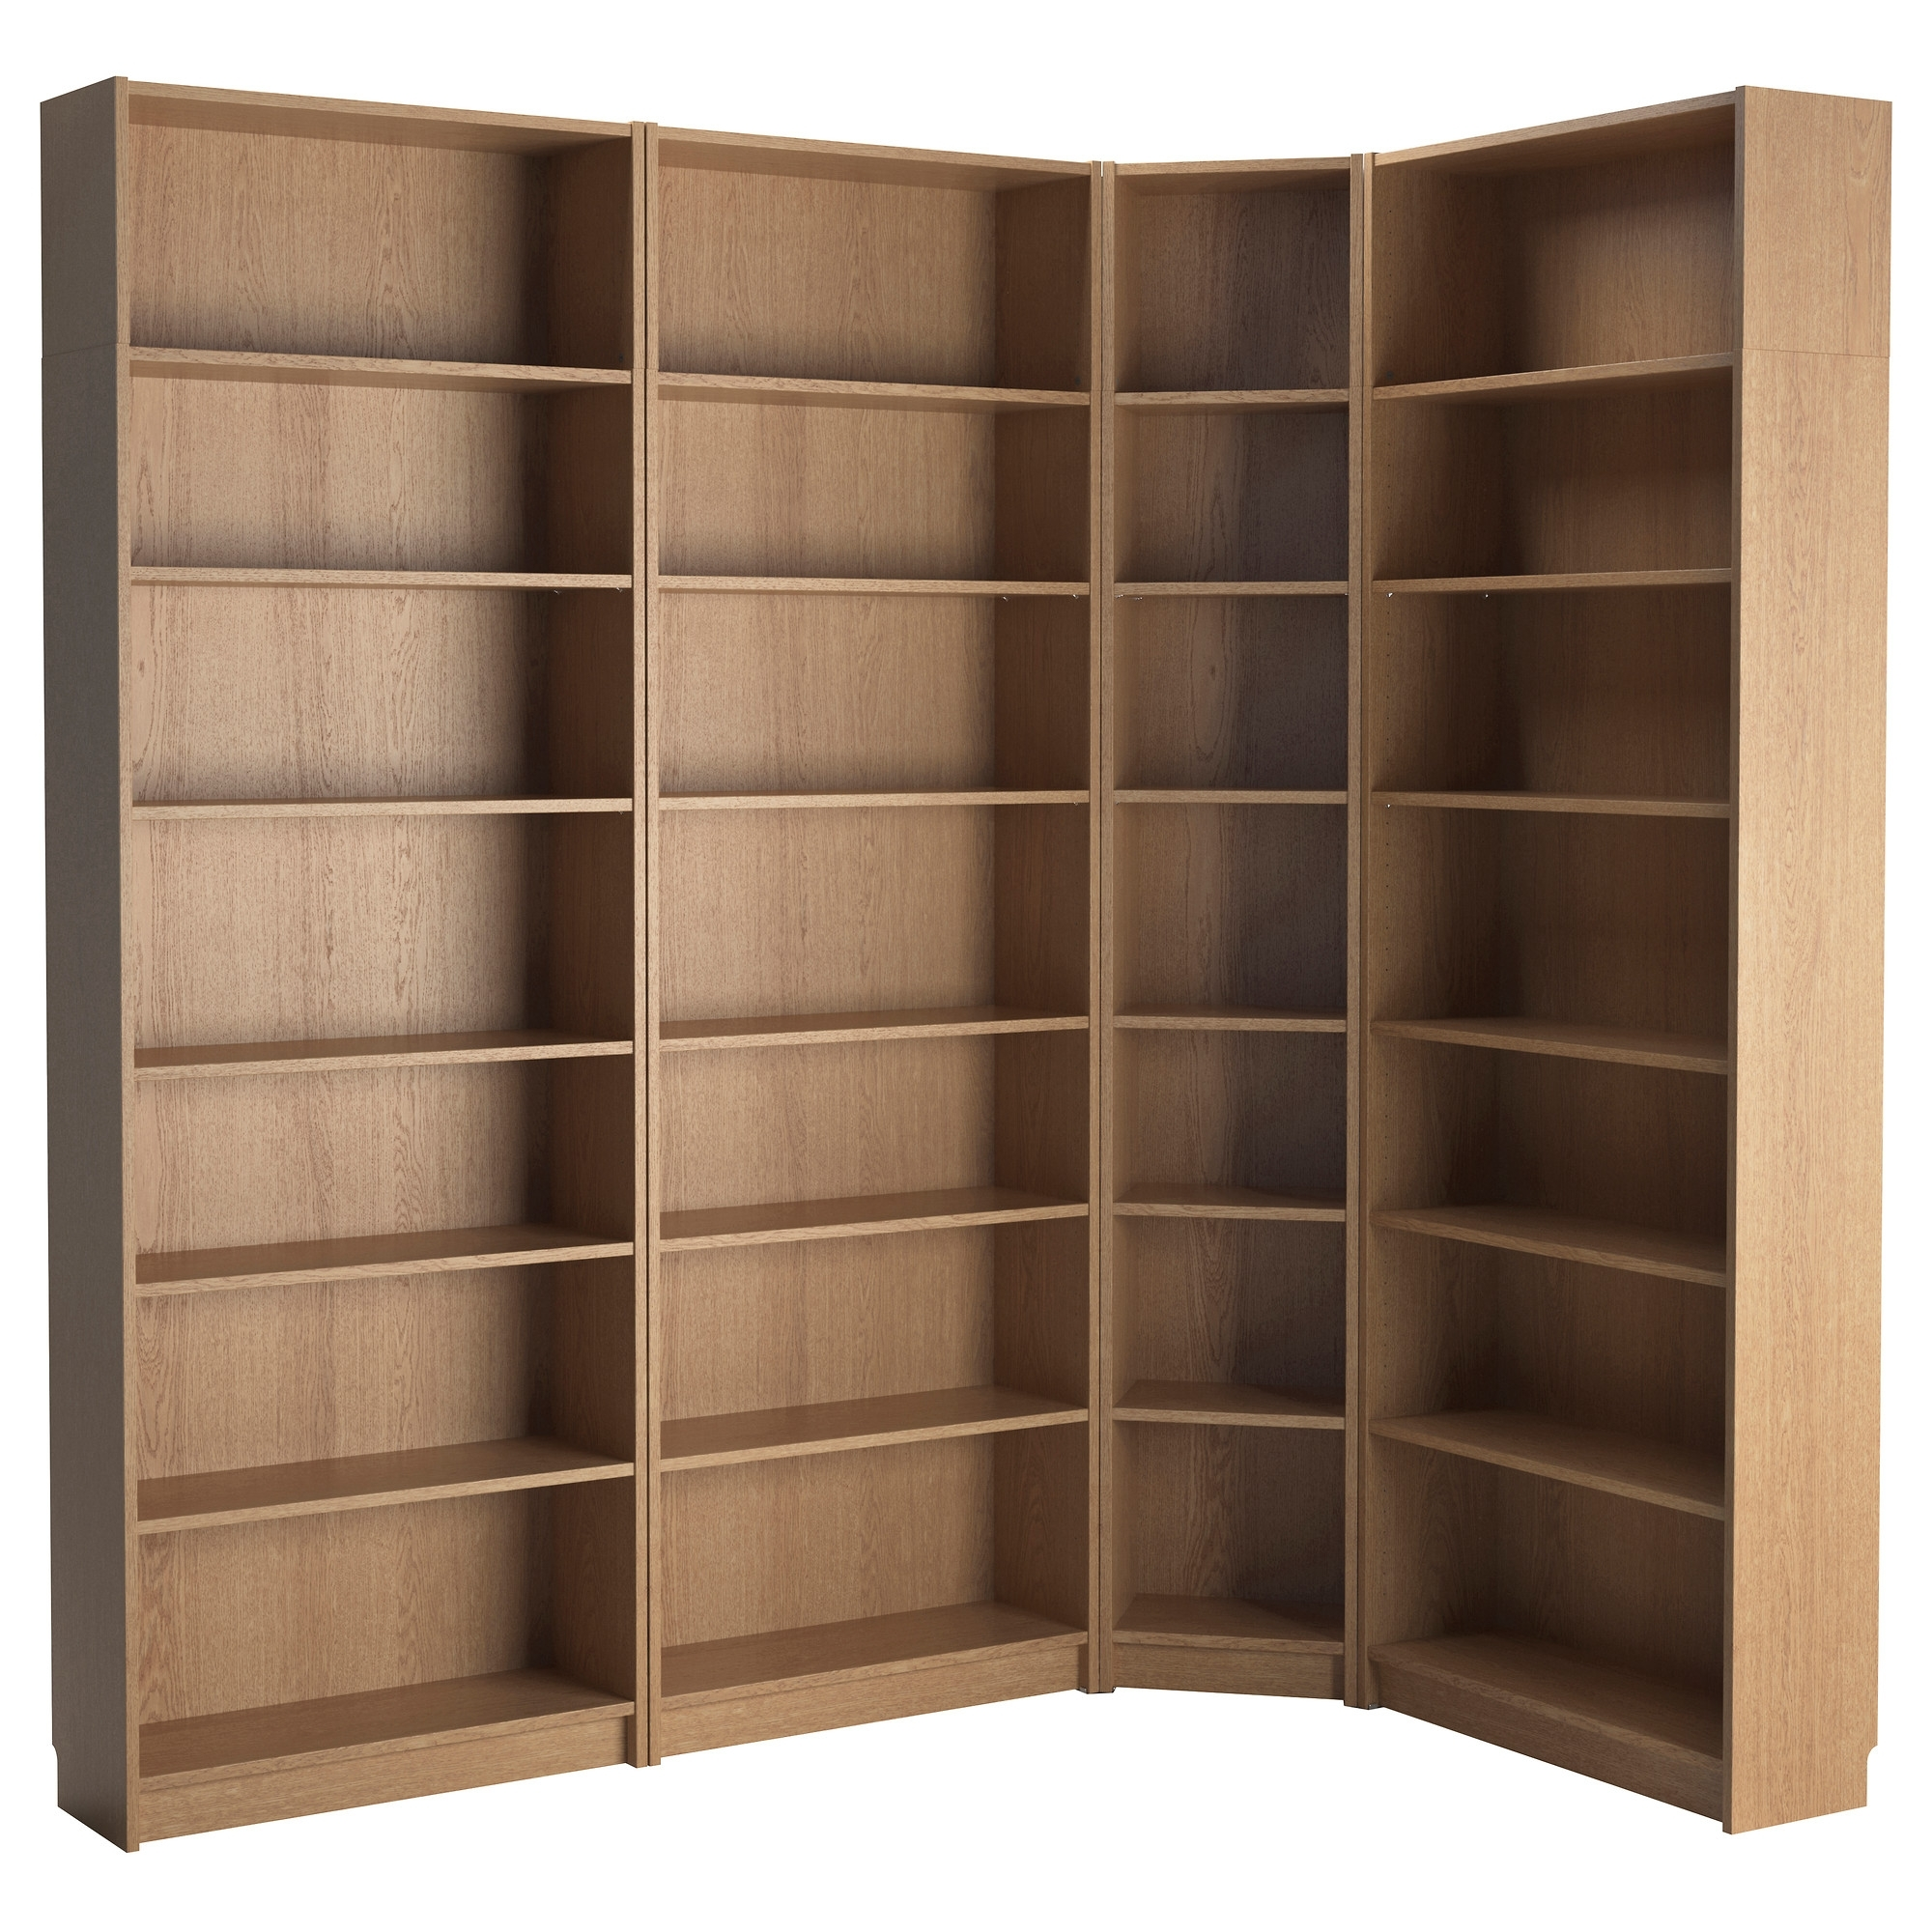 ikea birch bookshelf bookcase of astonishing amazing bookcases current corner in unique billy luxury